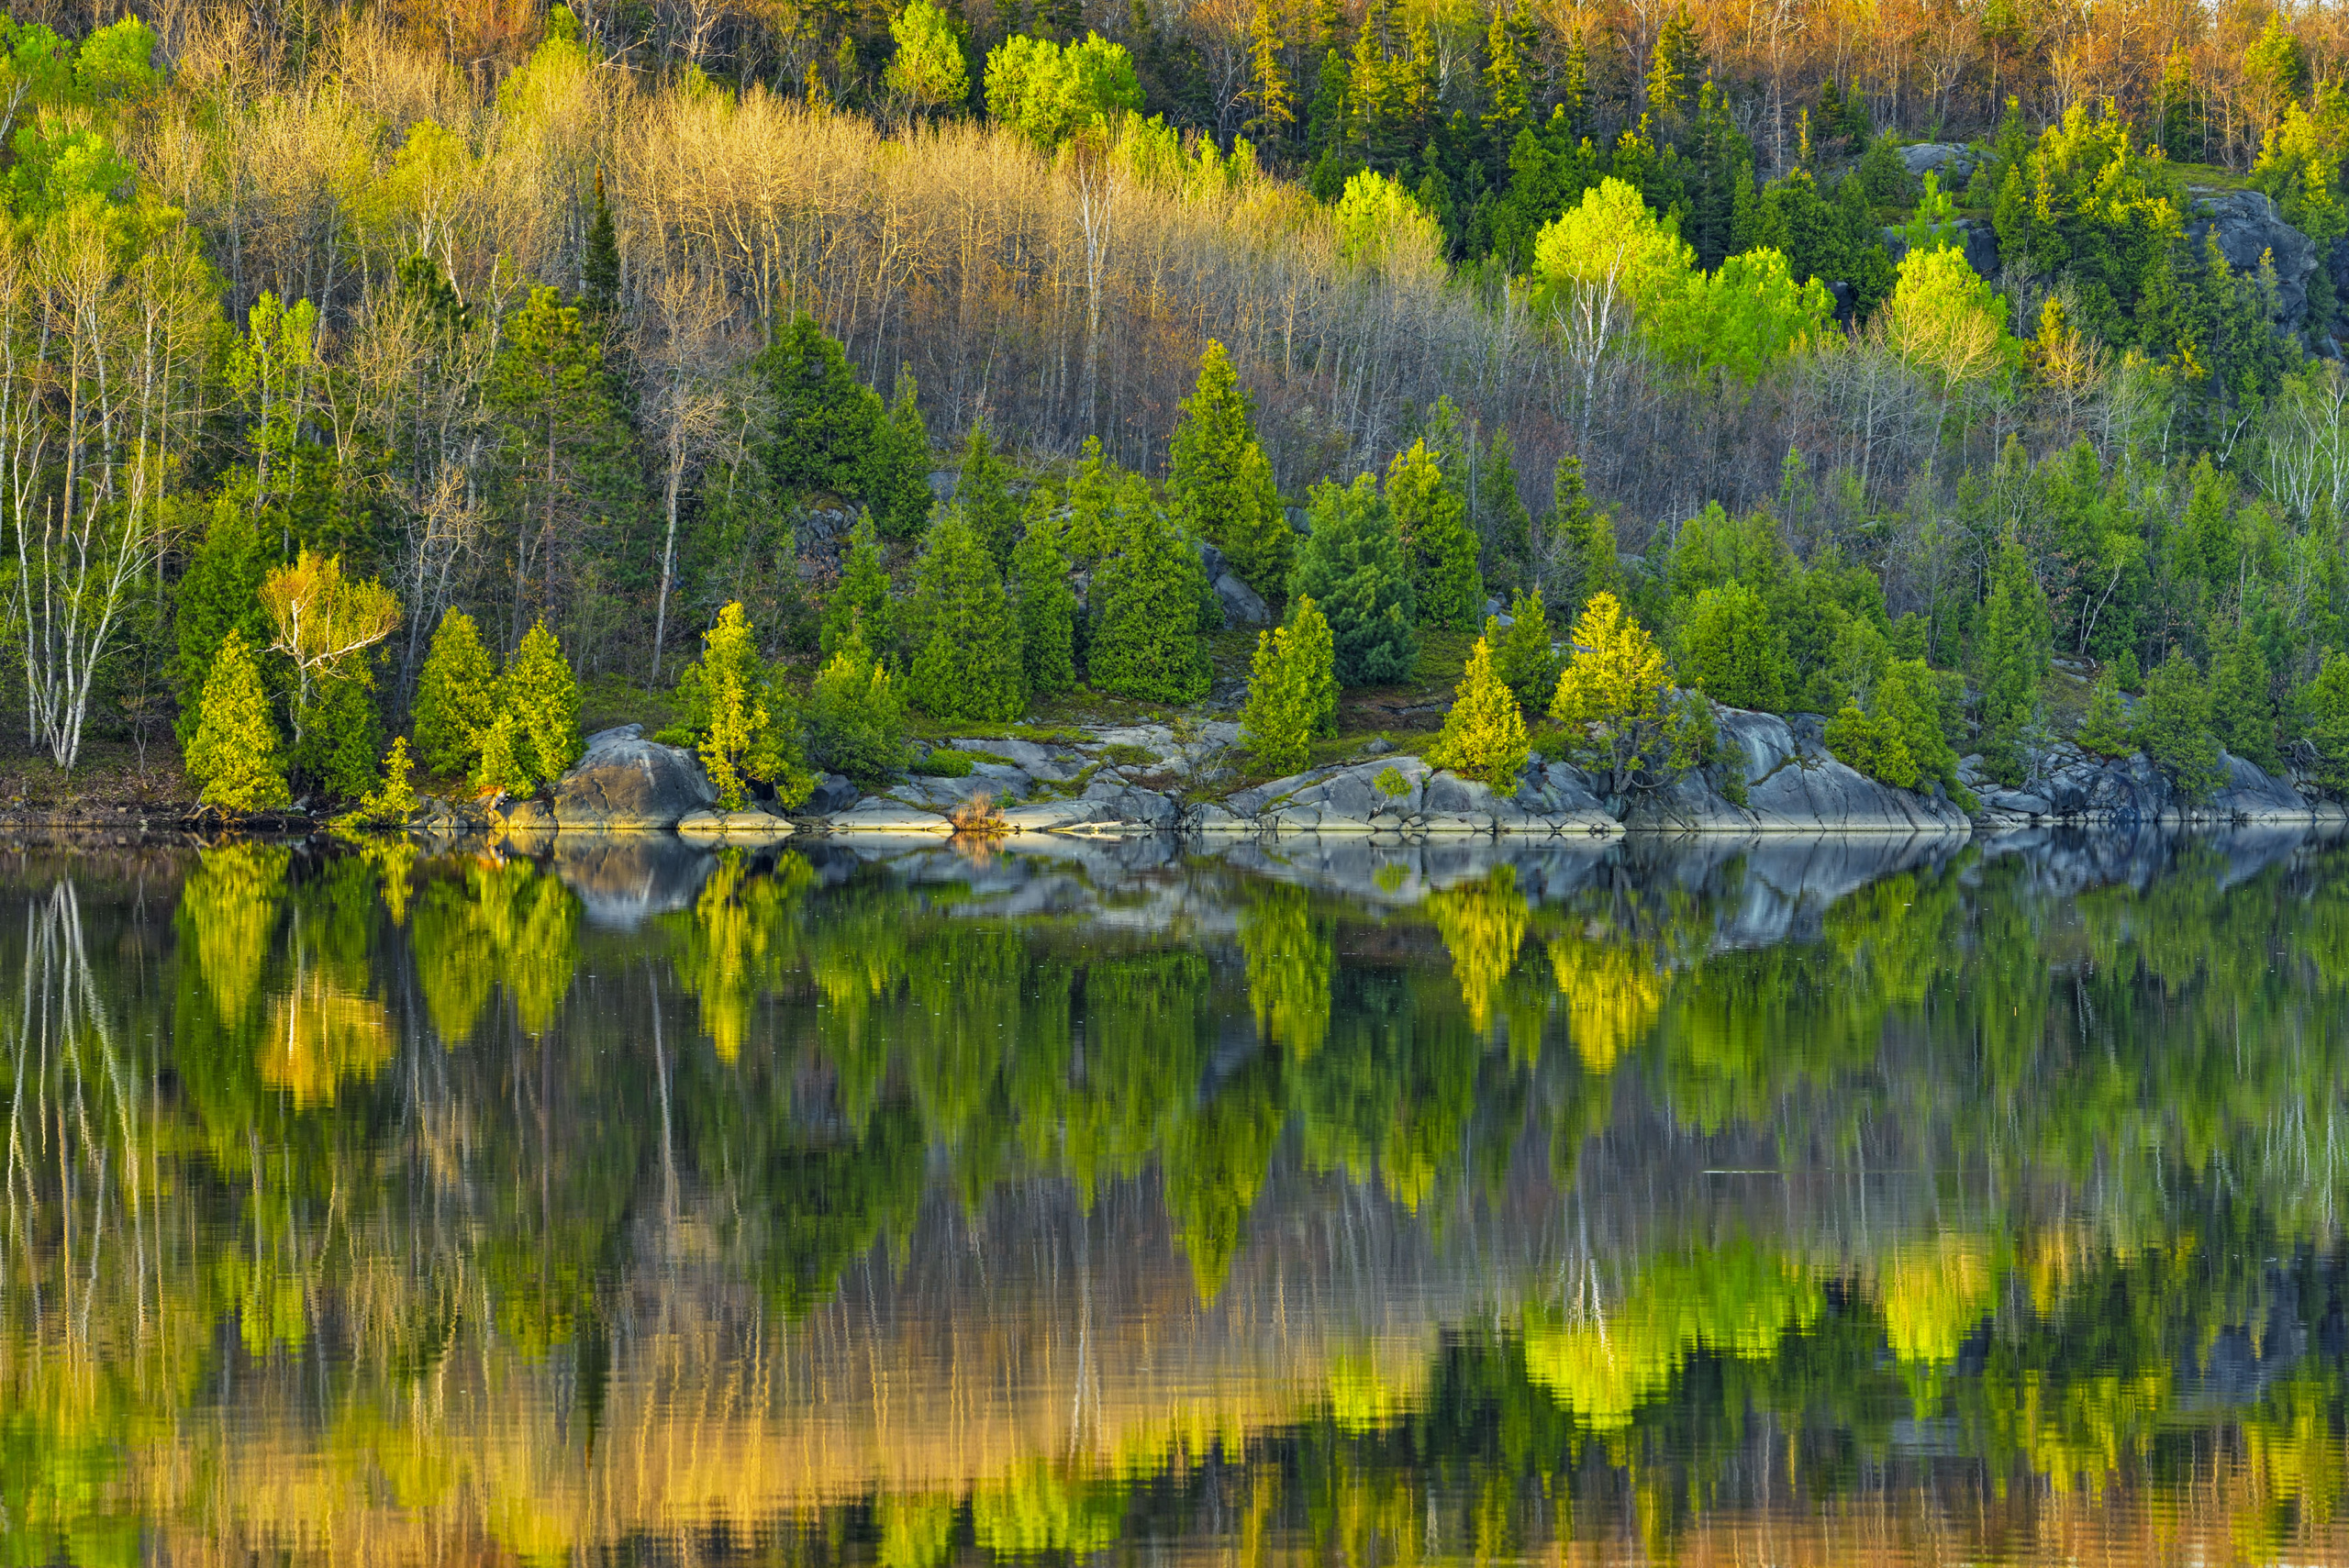 © Don Johnston, Spring Reflections in Simon Lake, 2019, Sudbury, Ontario